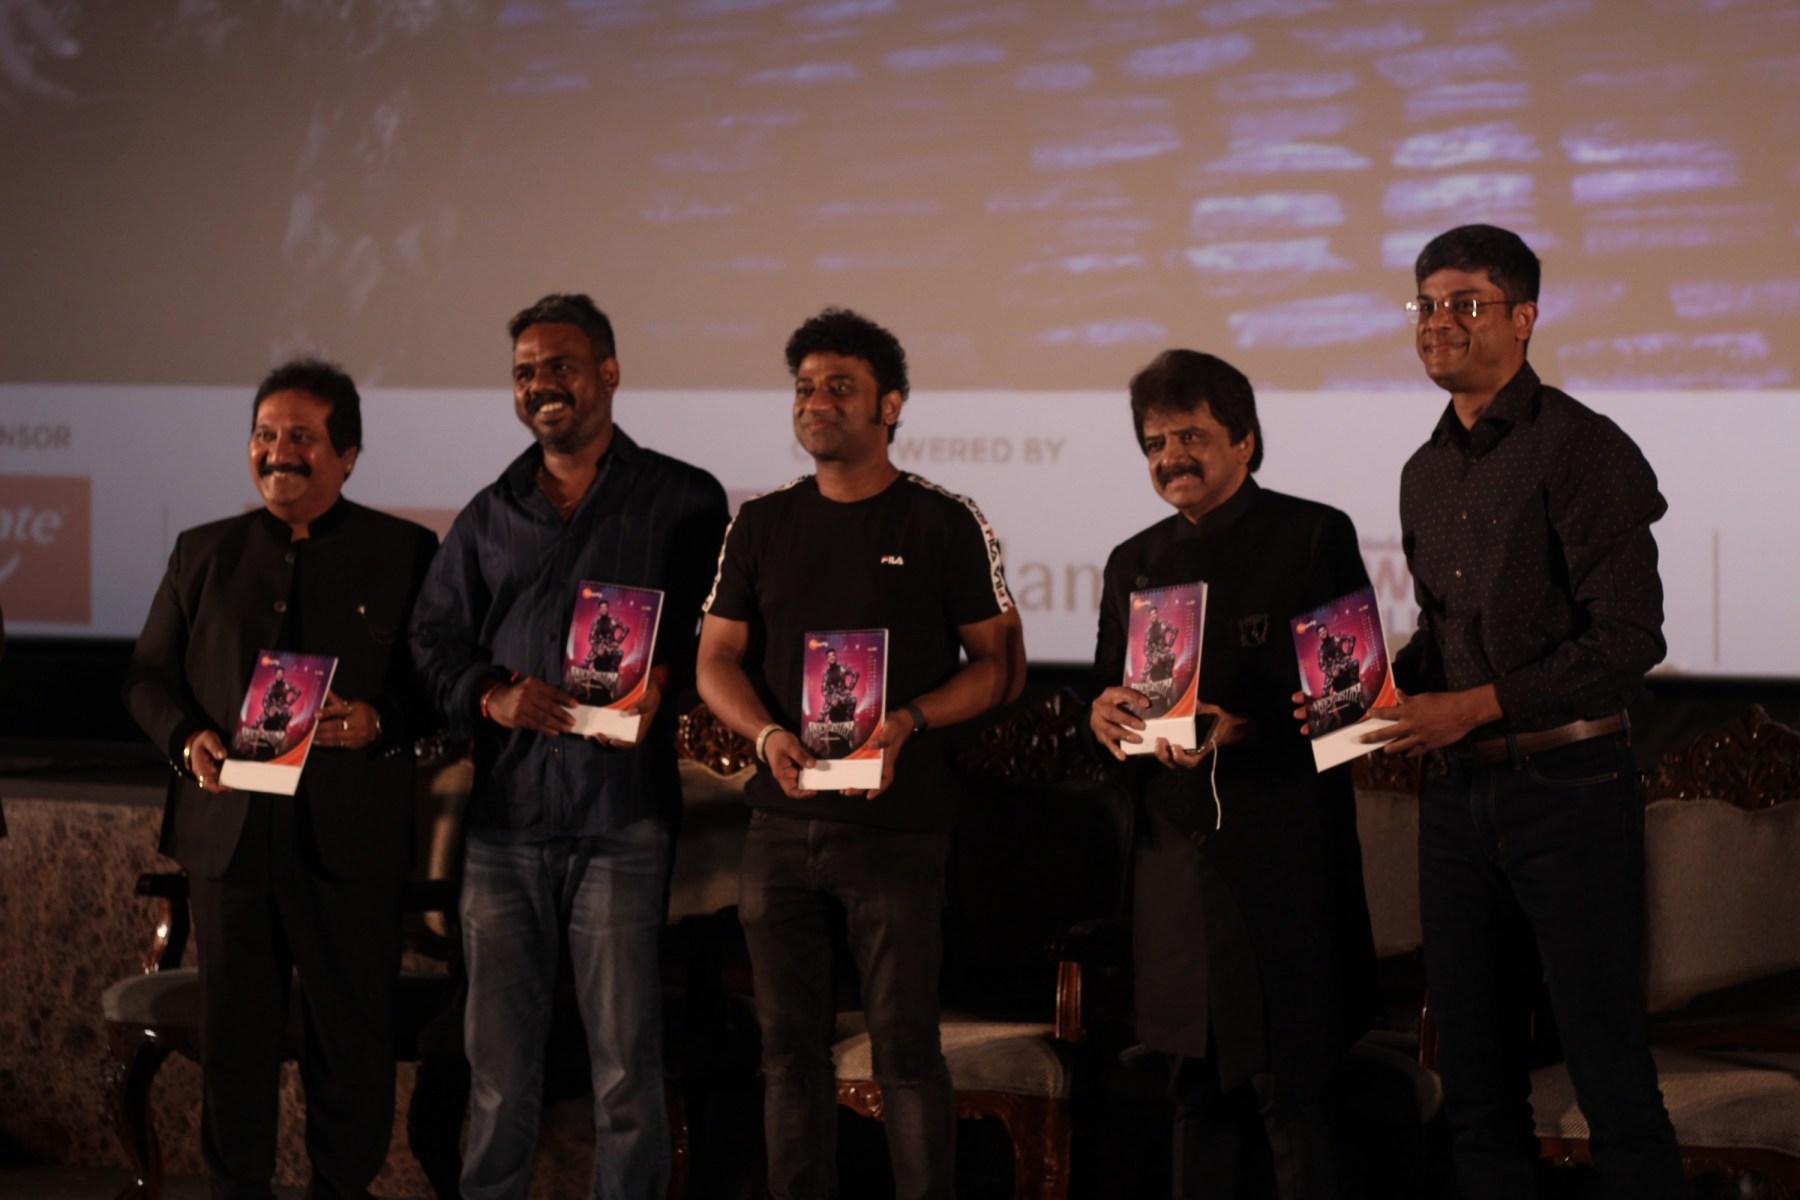 Rockstar-Music-reality-show-in-Zee-Tamil-20